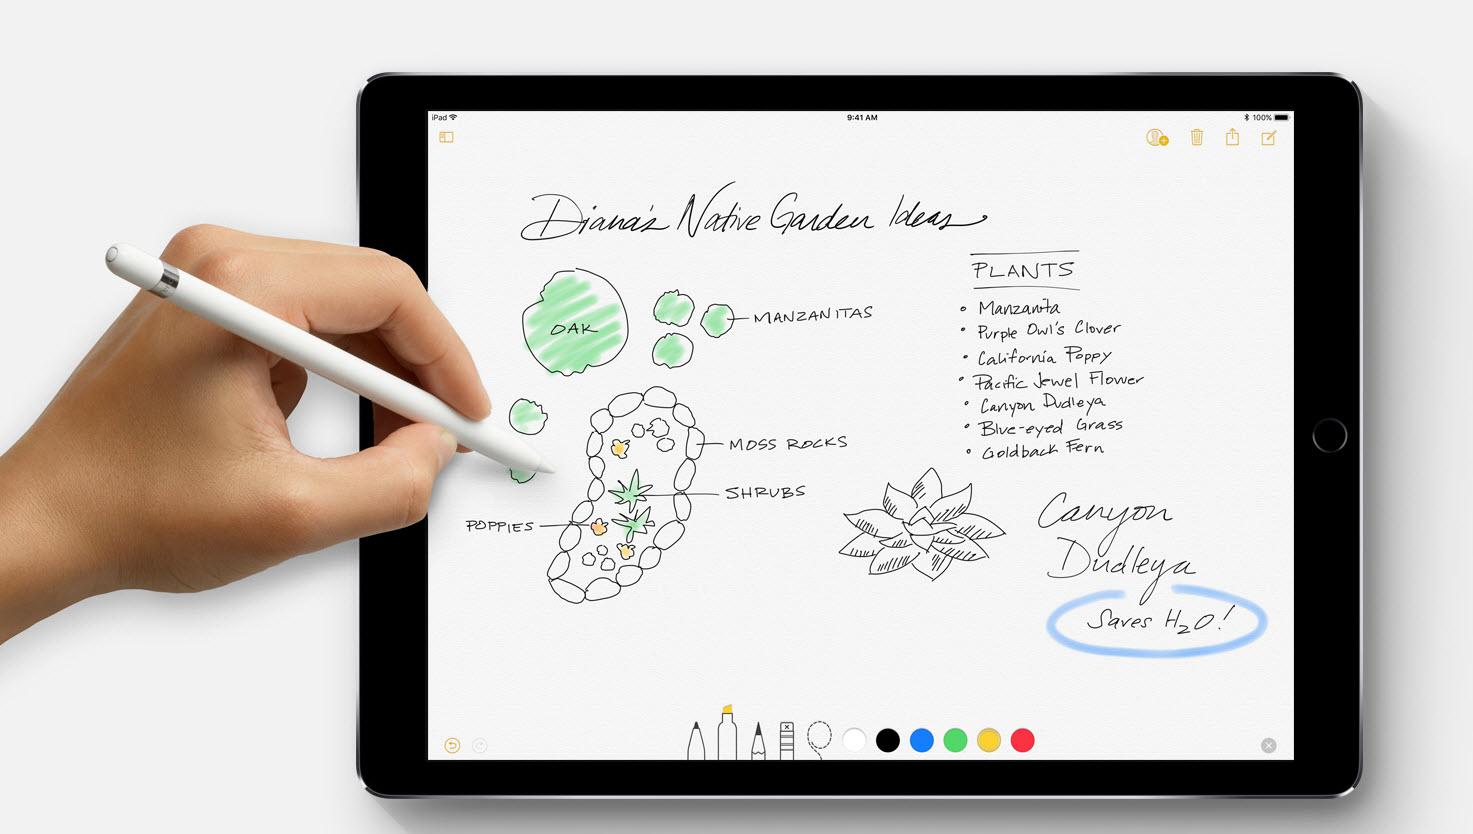 Notas บน iOS 11 iPad Pro